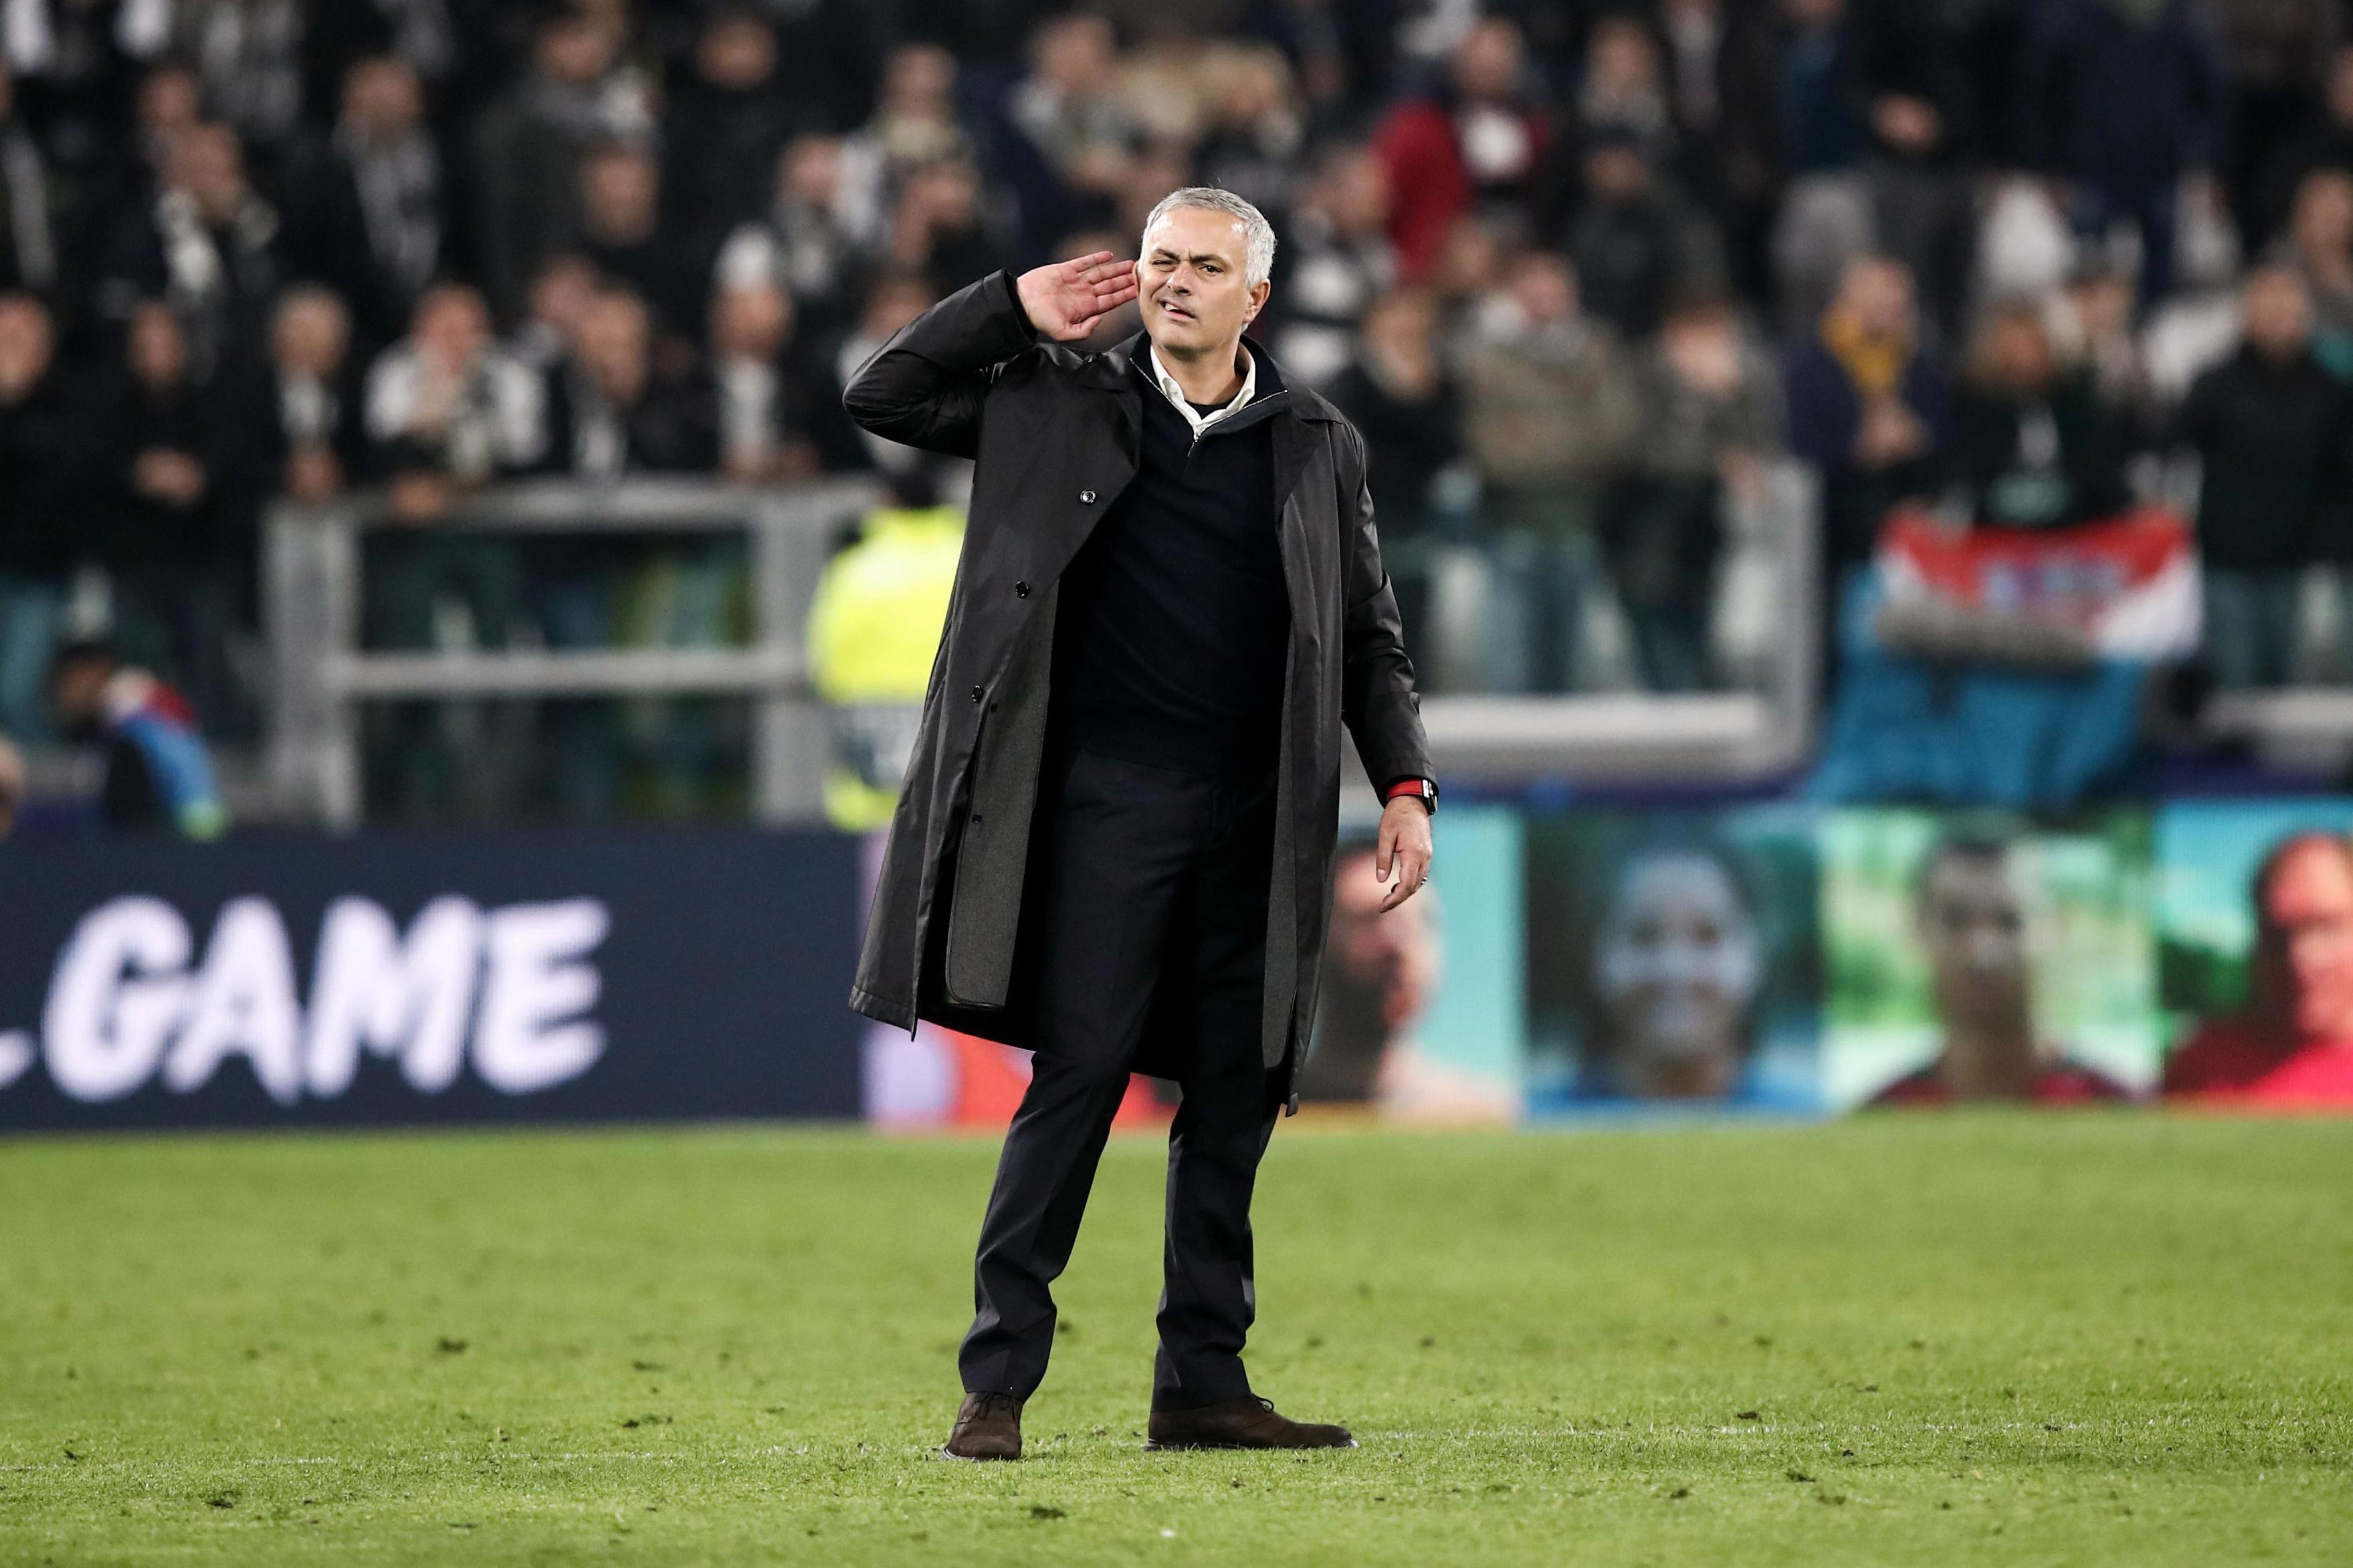 Gary Neville Mangaku Menyukai Gaya Mourinho